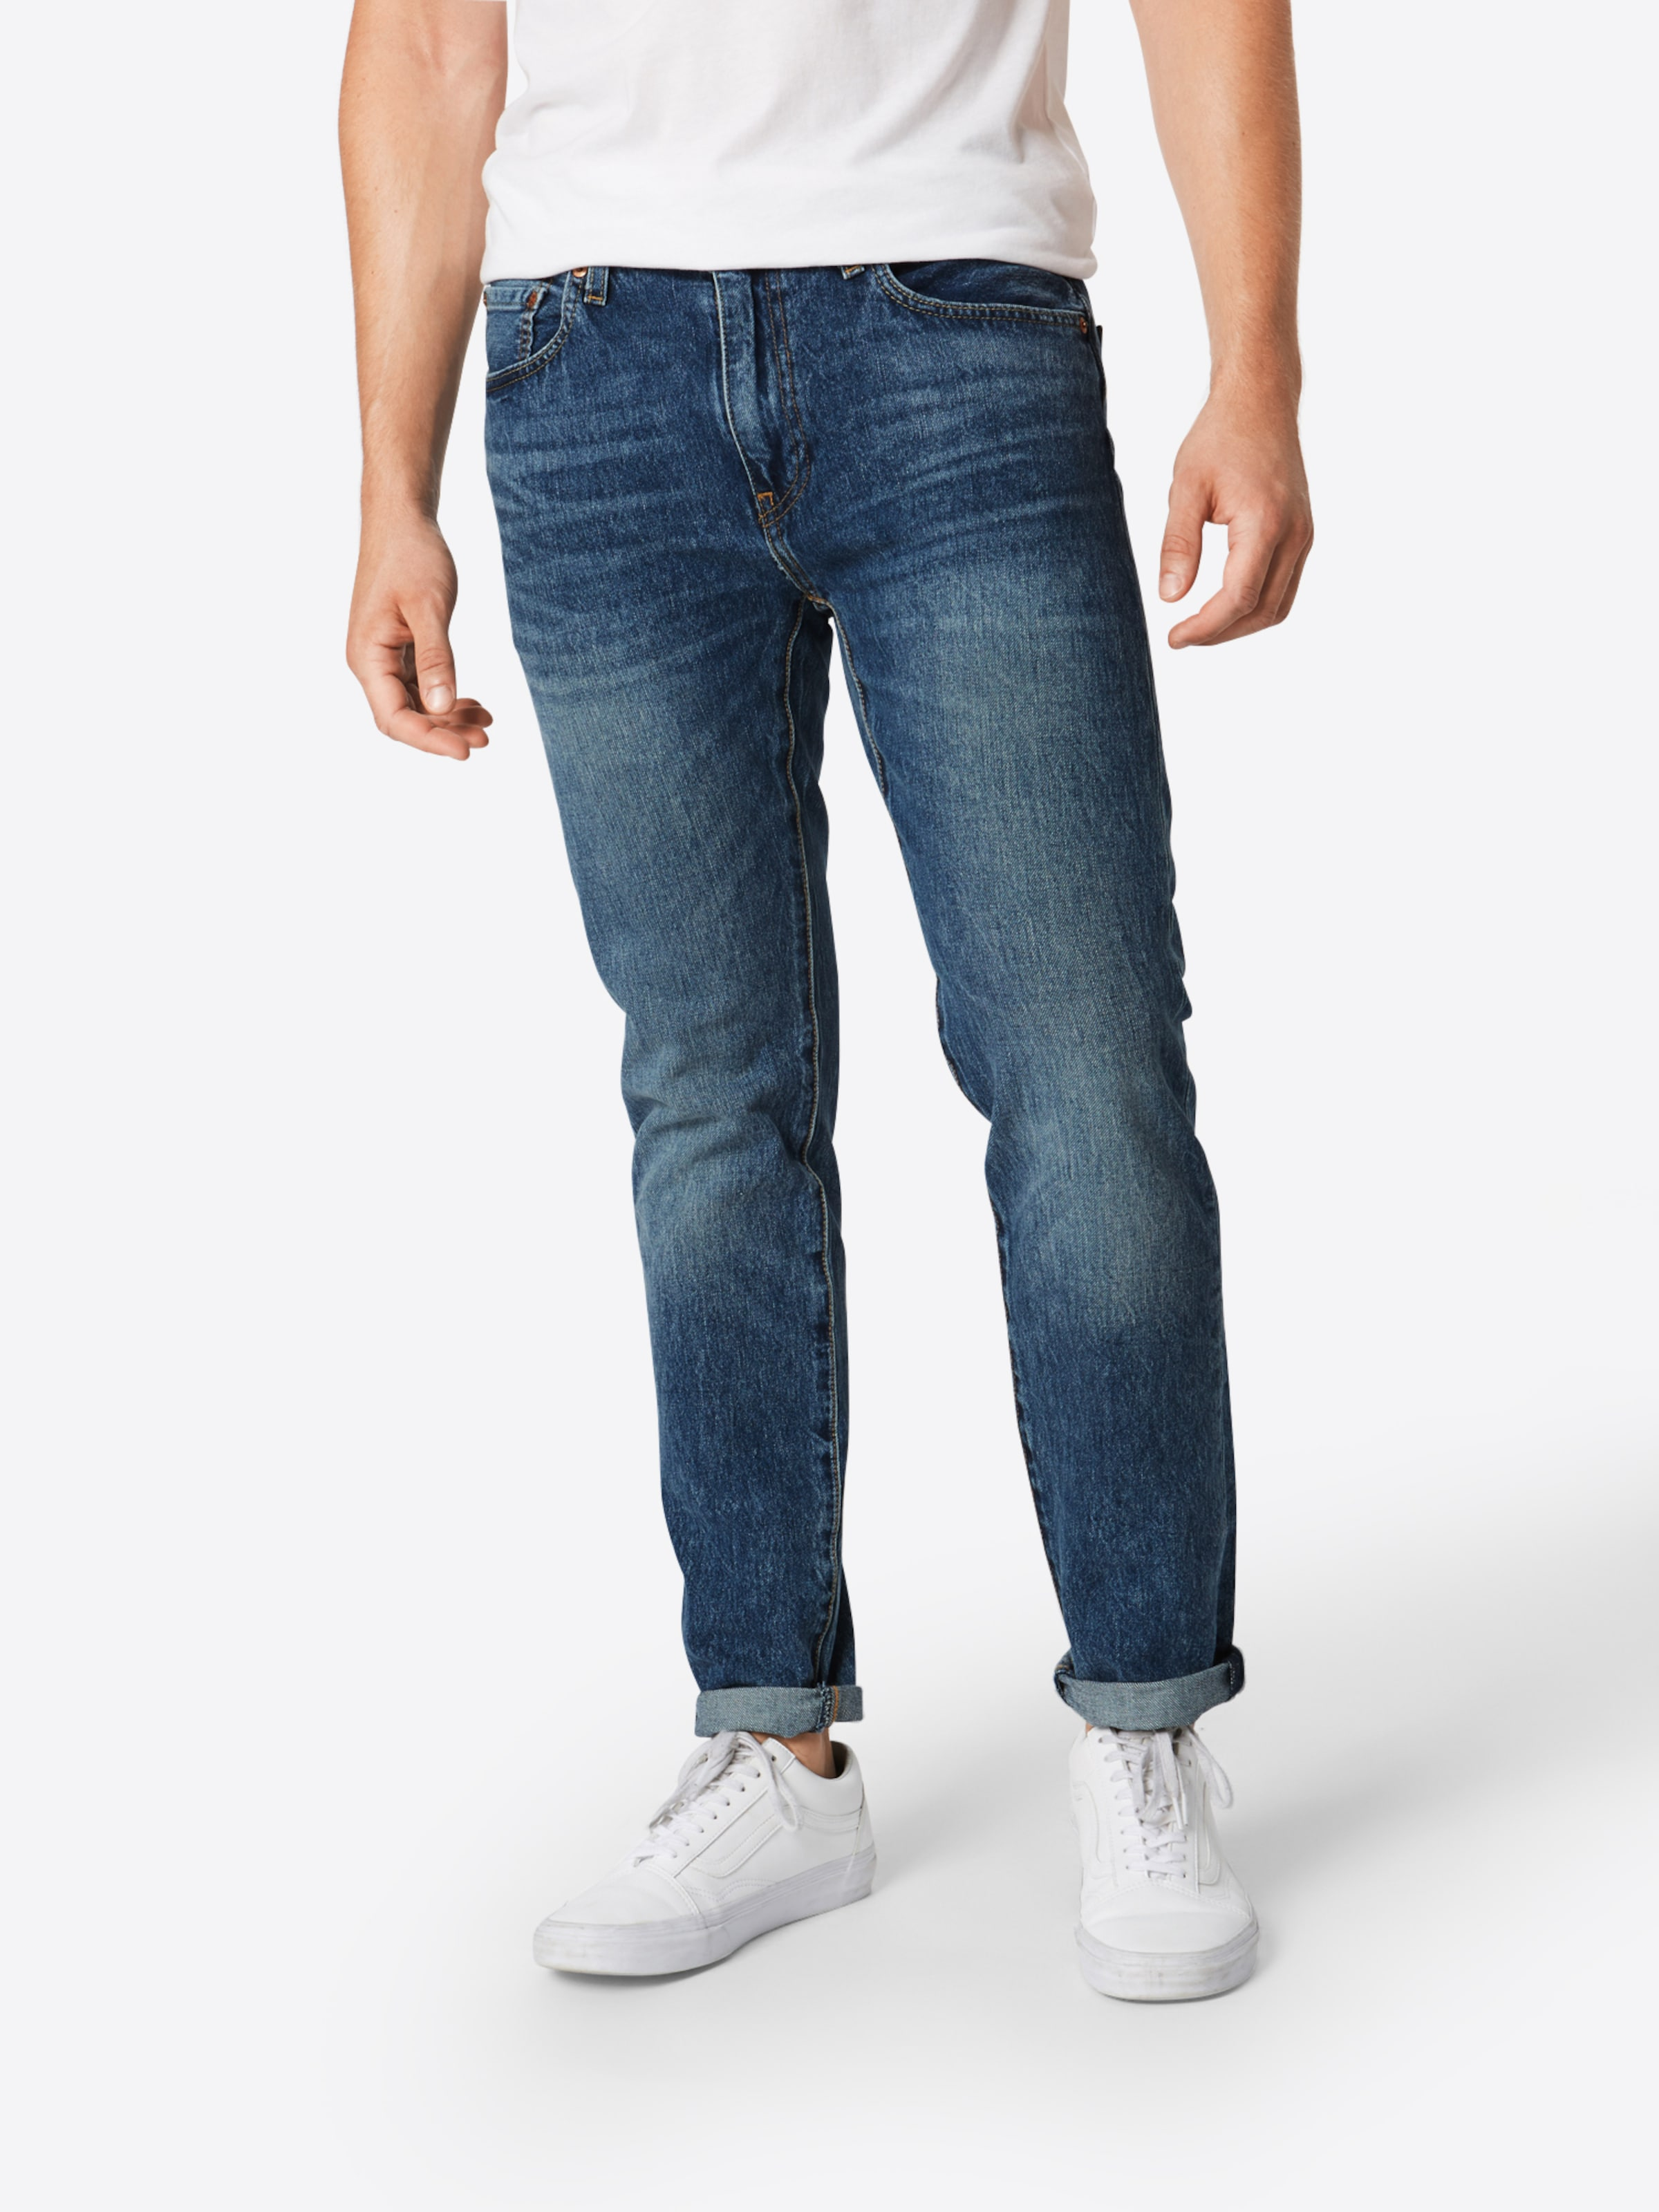 Levi's Levi's Blue Jeans Levi's Denim Jeans '512�In Jeans Blue Denim '512�In jqUzVSGLMp